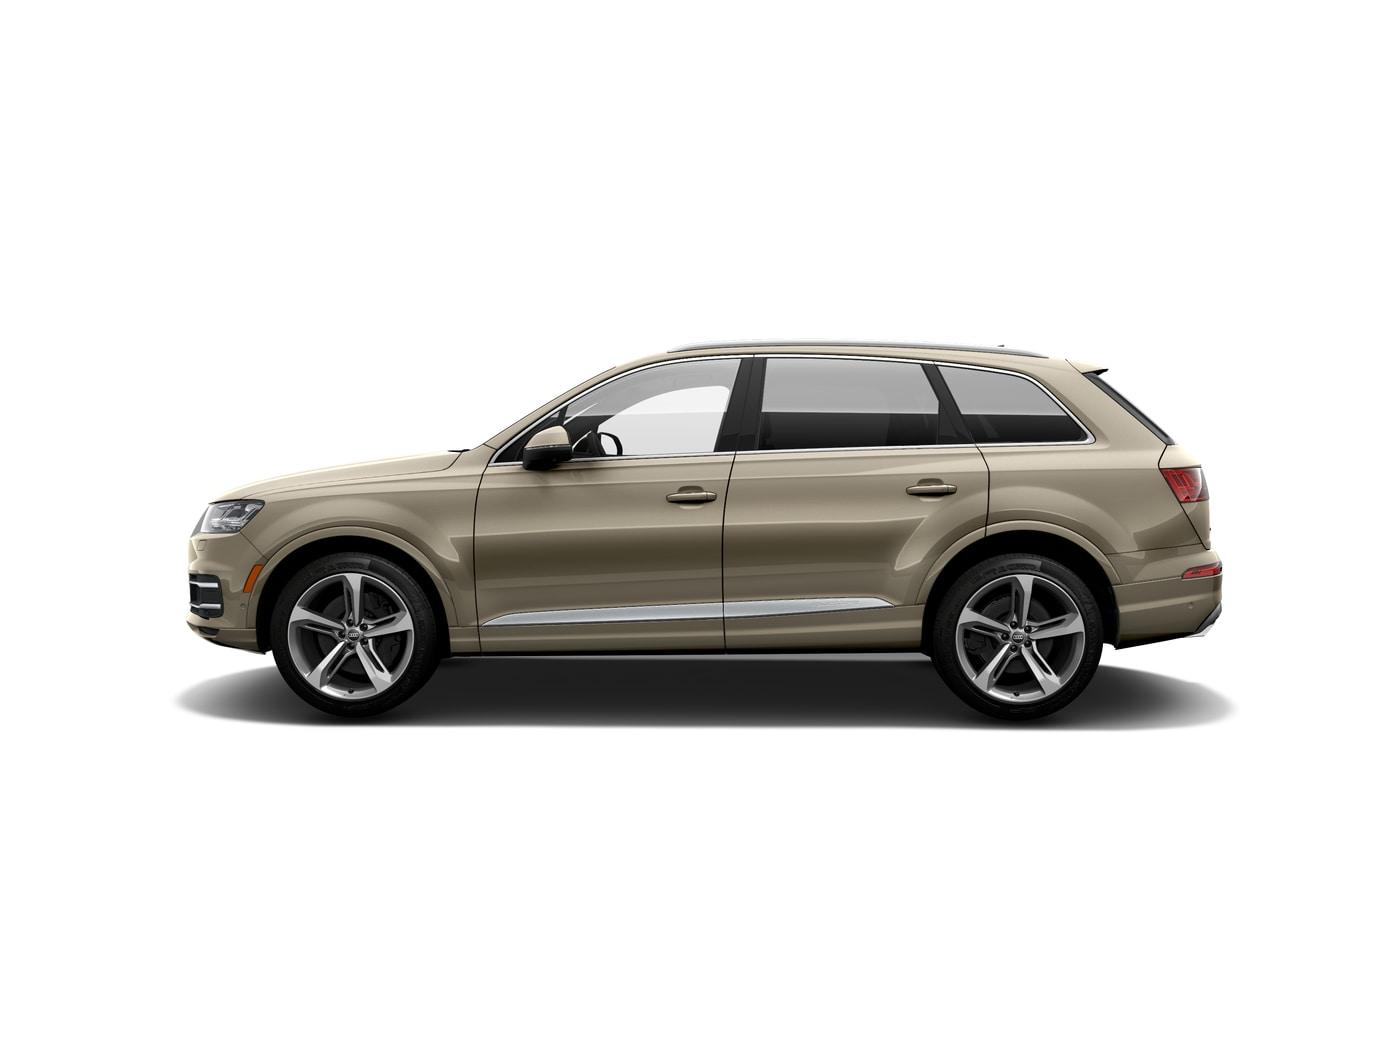 New 2019 Audi Q7 For Sale at Audi Kalamazoo | VIN: WA1VABF70KD018197